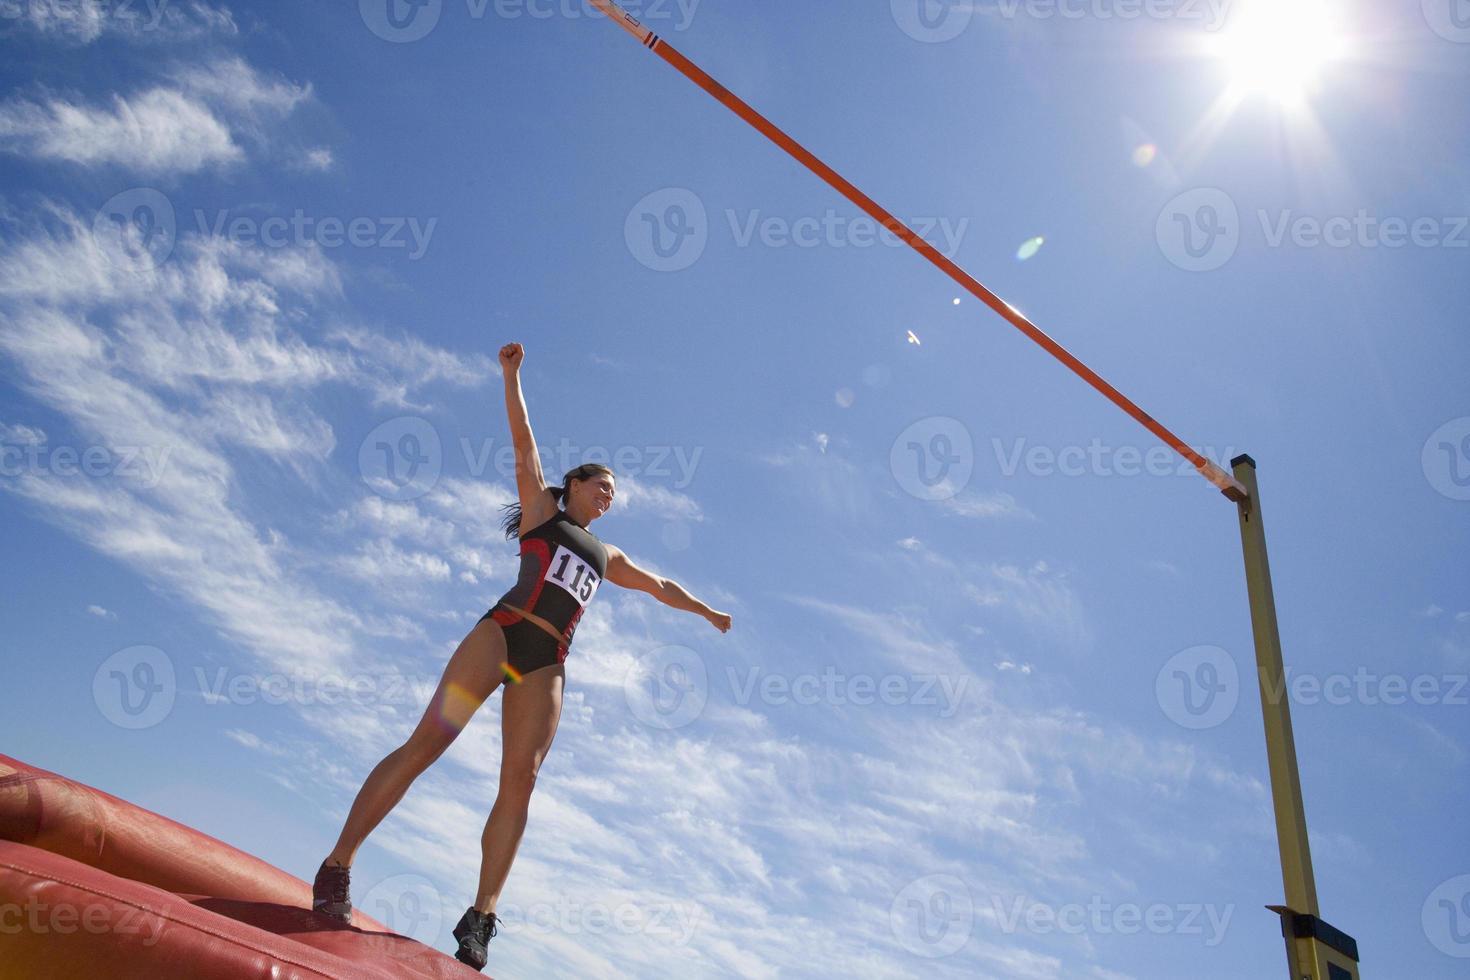 jeune, femme, athlète, préparer, sauter, barre, (lens flare) photo